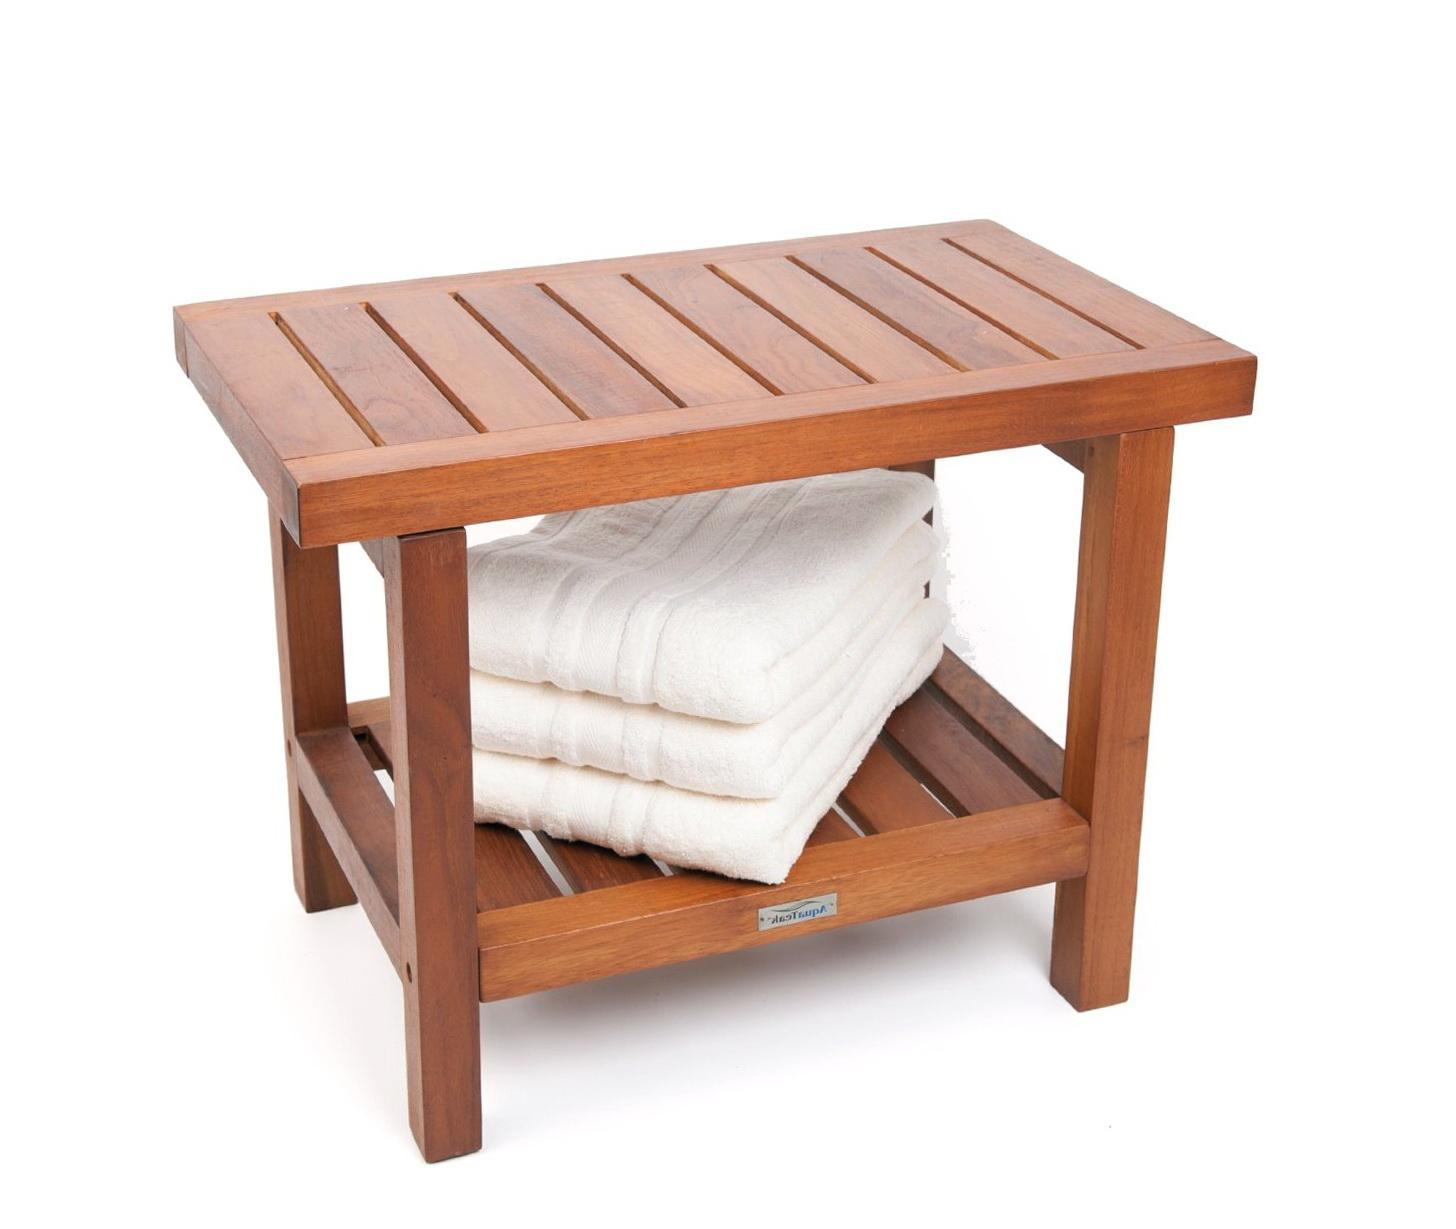 Teak Wood Shower Bench Plans